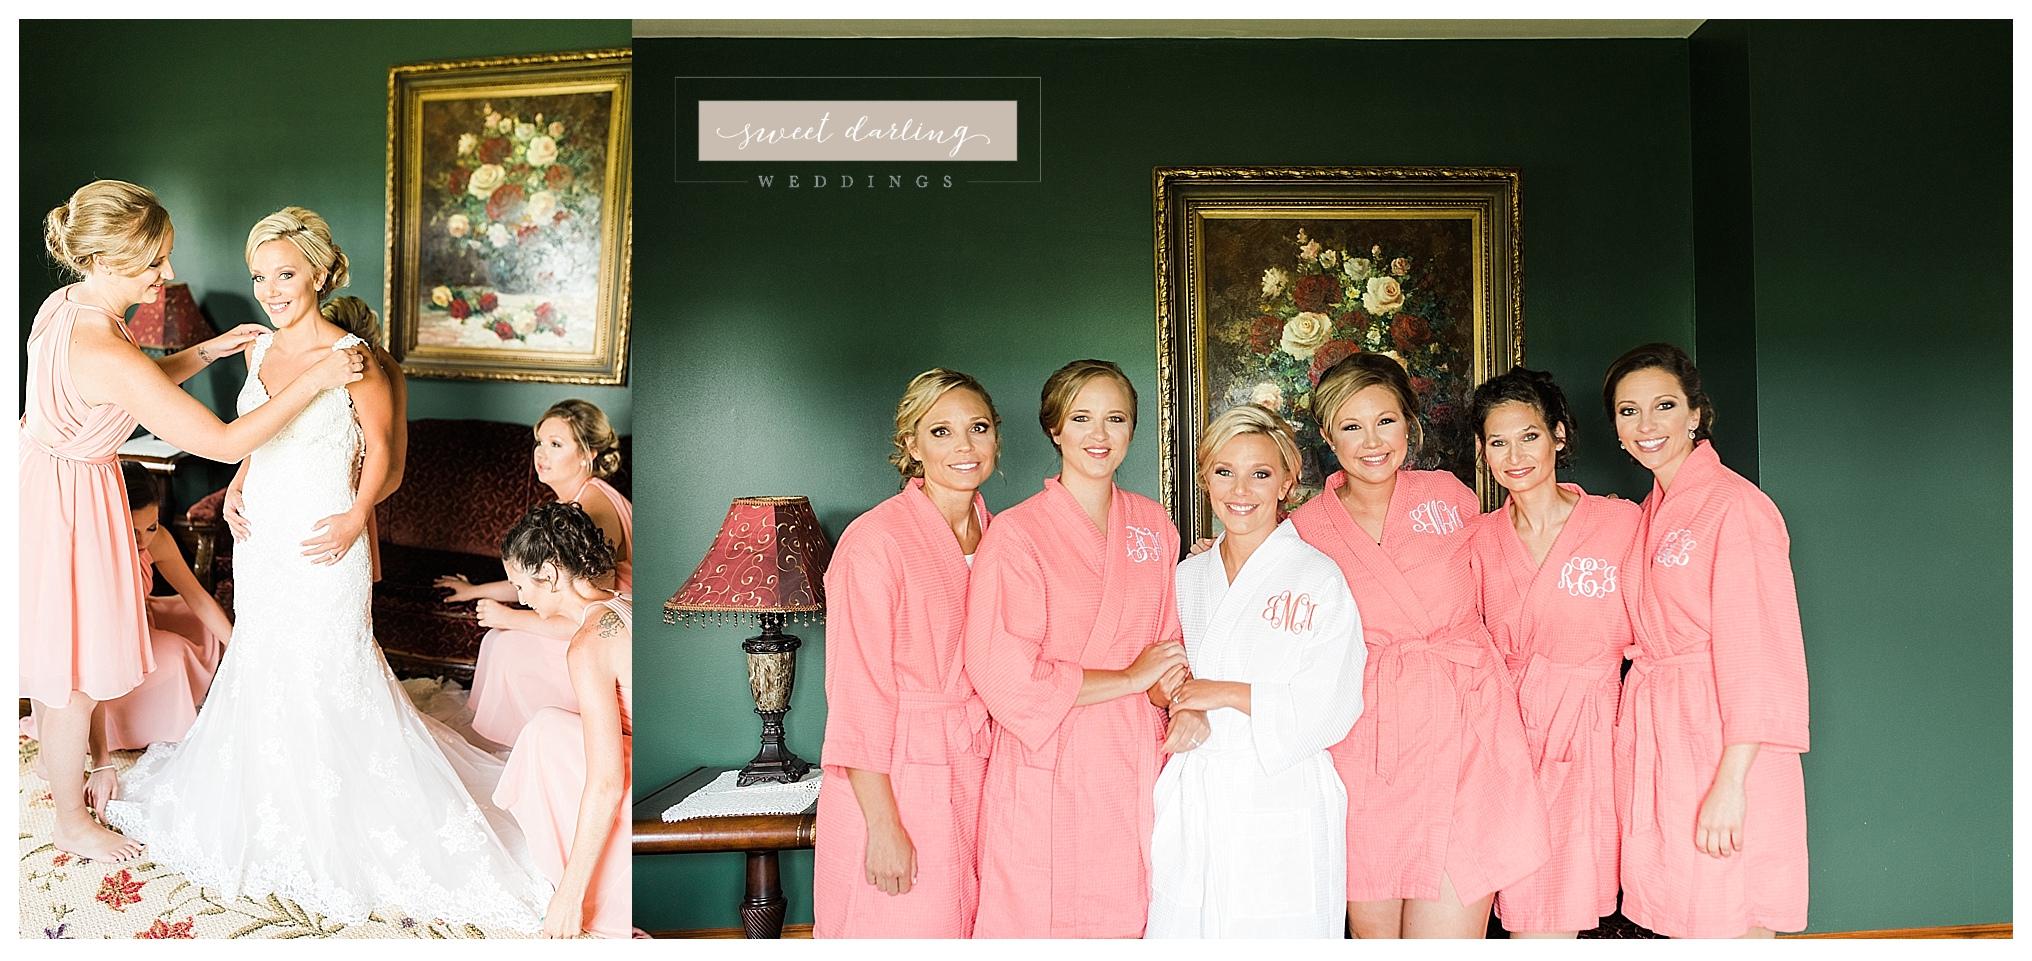 Paxton-illinois-engelbrecht-farmstead-romantic-wedding-photographer-sweet-darling-weddings_1205.jpg